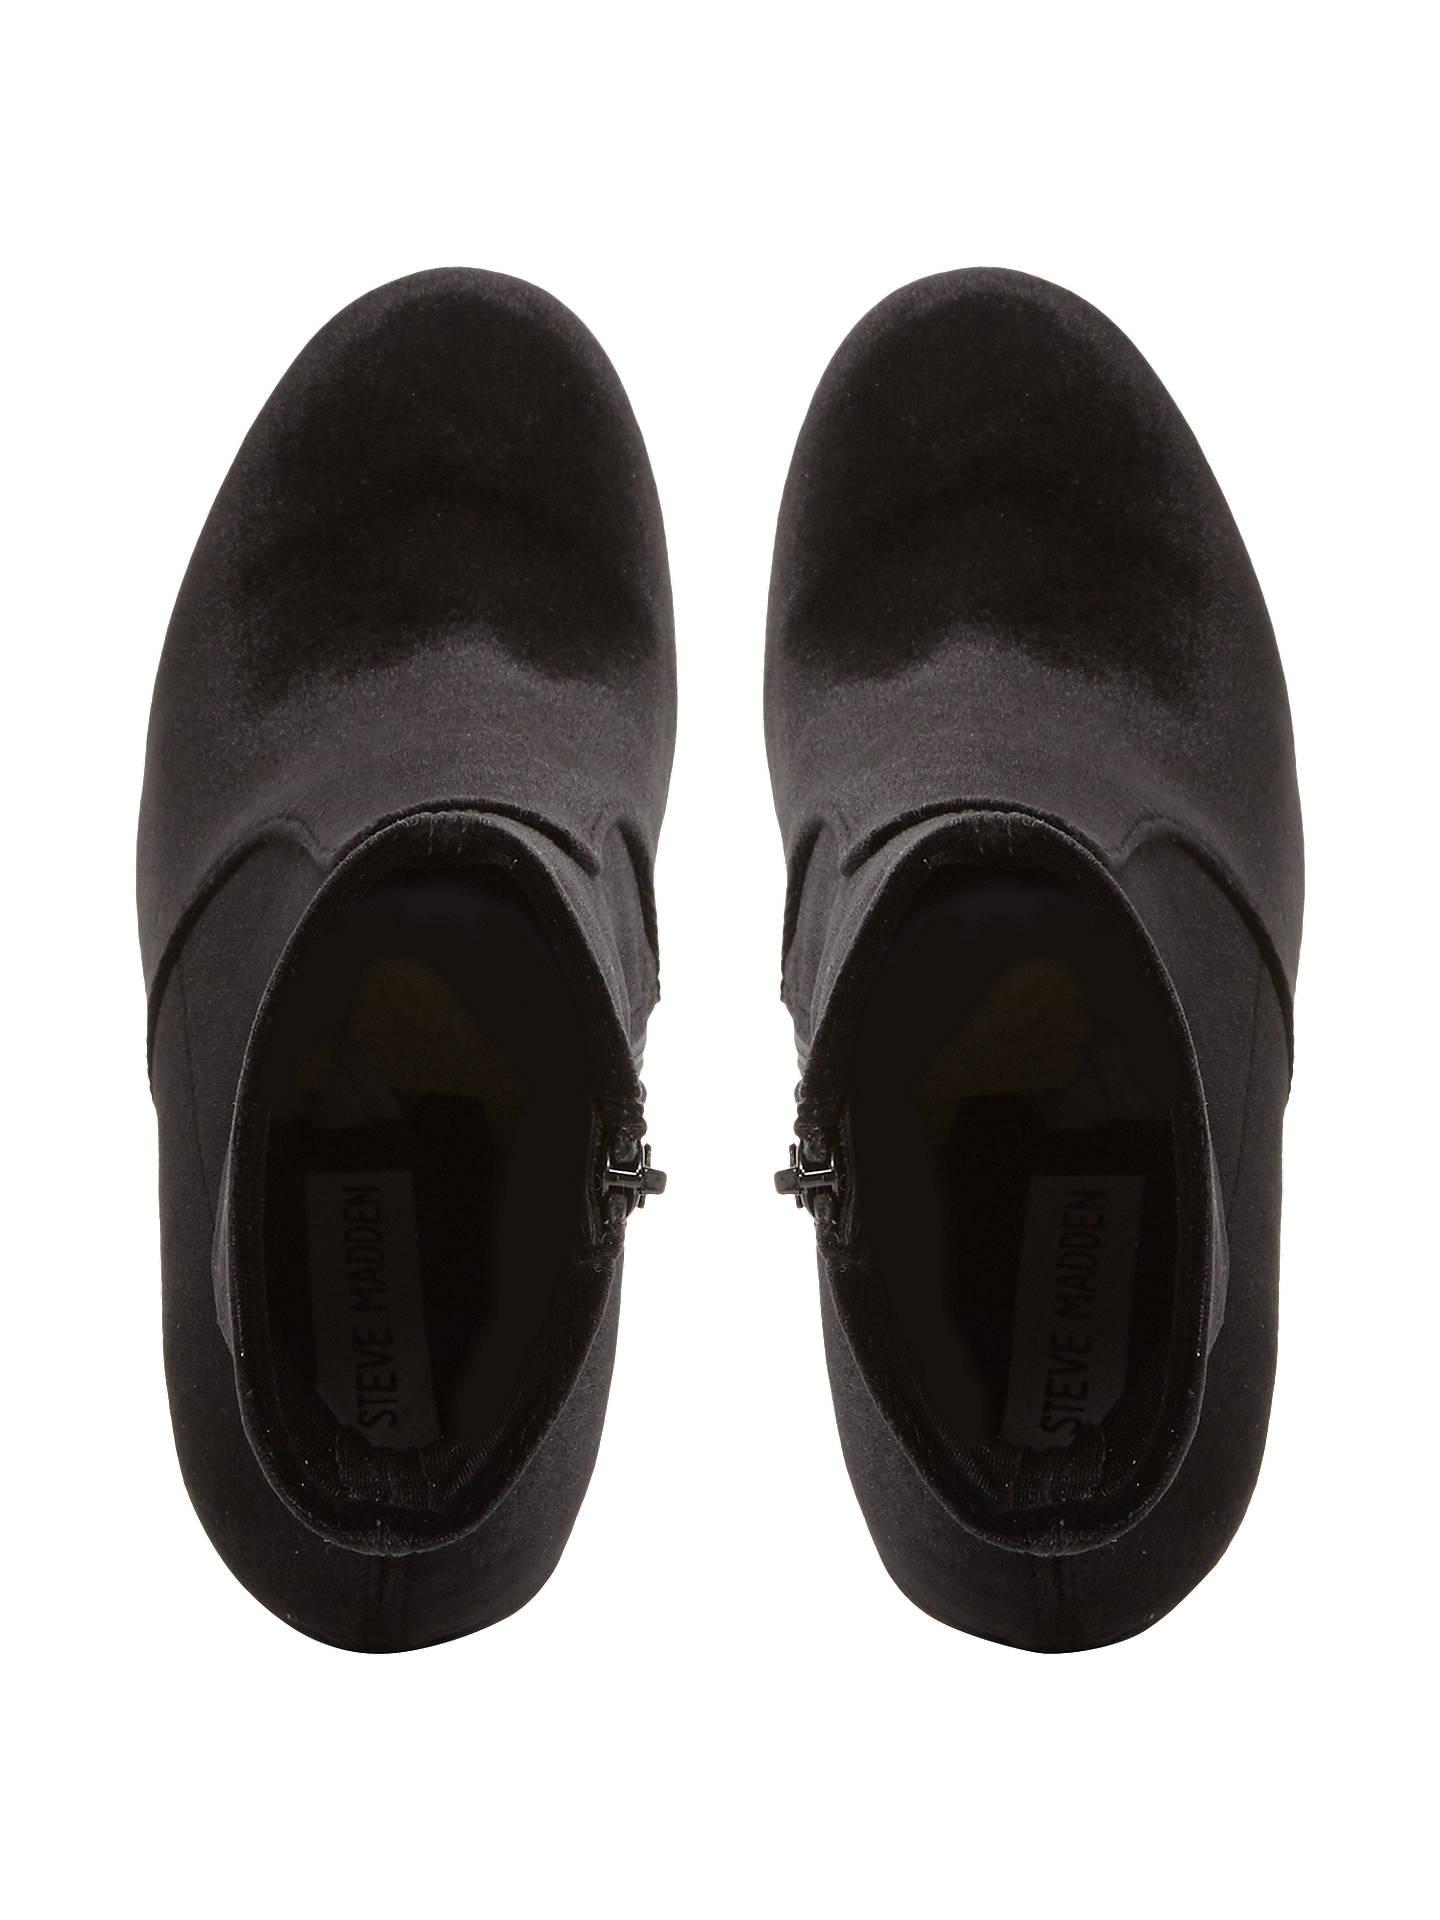 ed064771f072 ... Buy Steve Madden Stardust Platform Block Heeled Ankle Boots